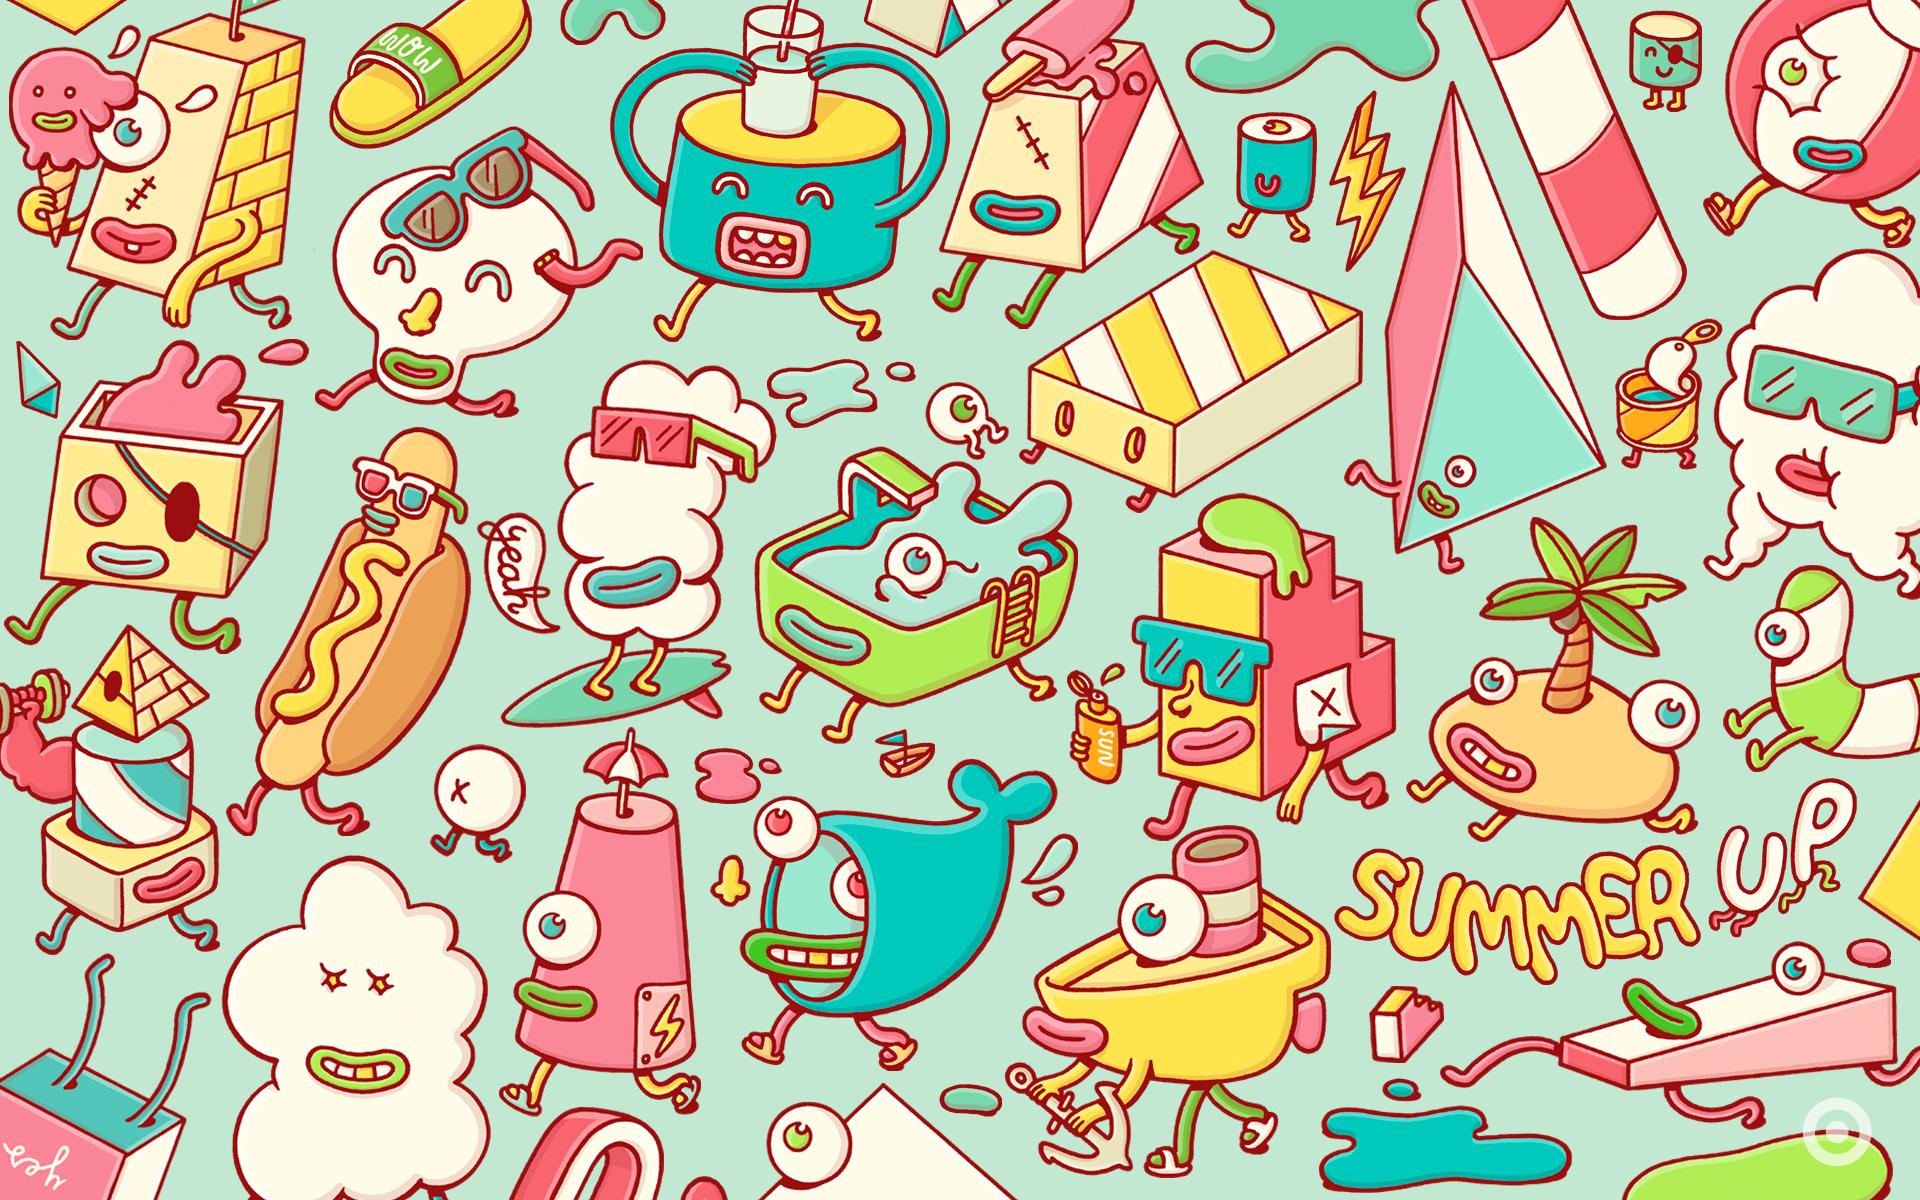 Animal Print Wall Stickers Cute Doodle Wallpaper Tumblr Www Pixshark Com Images